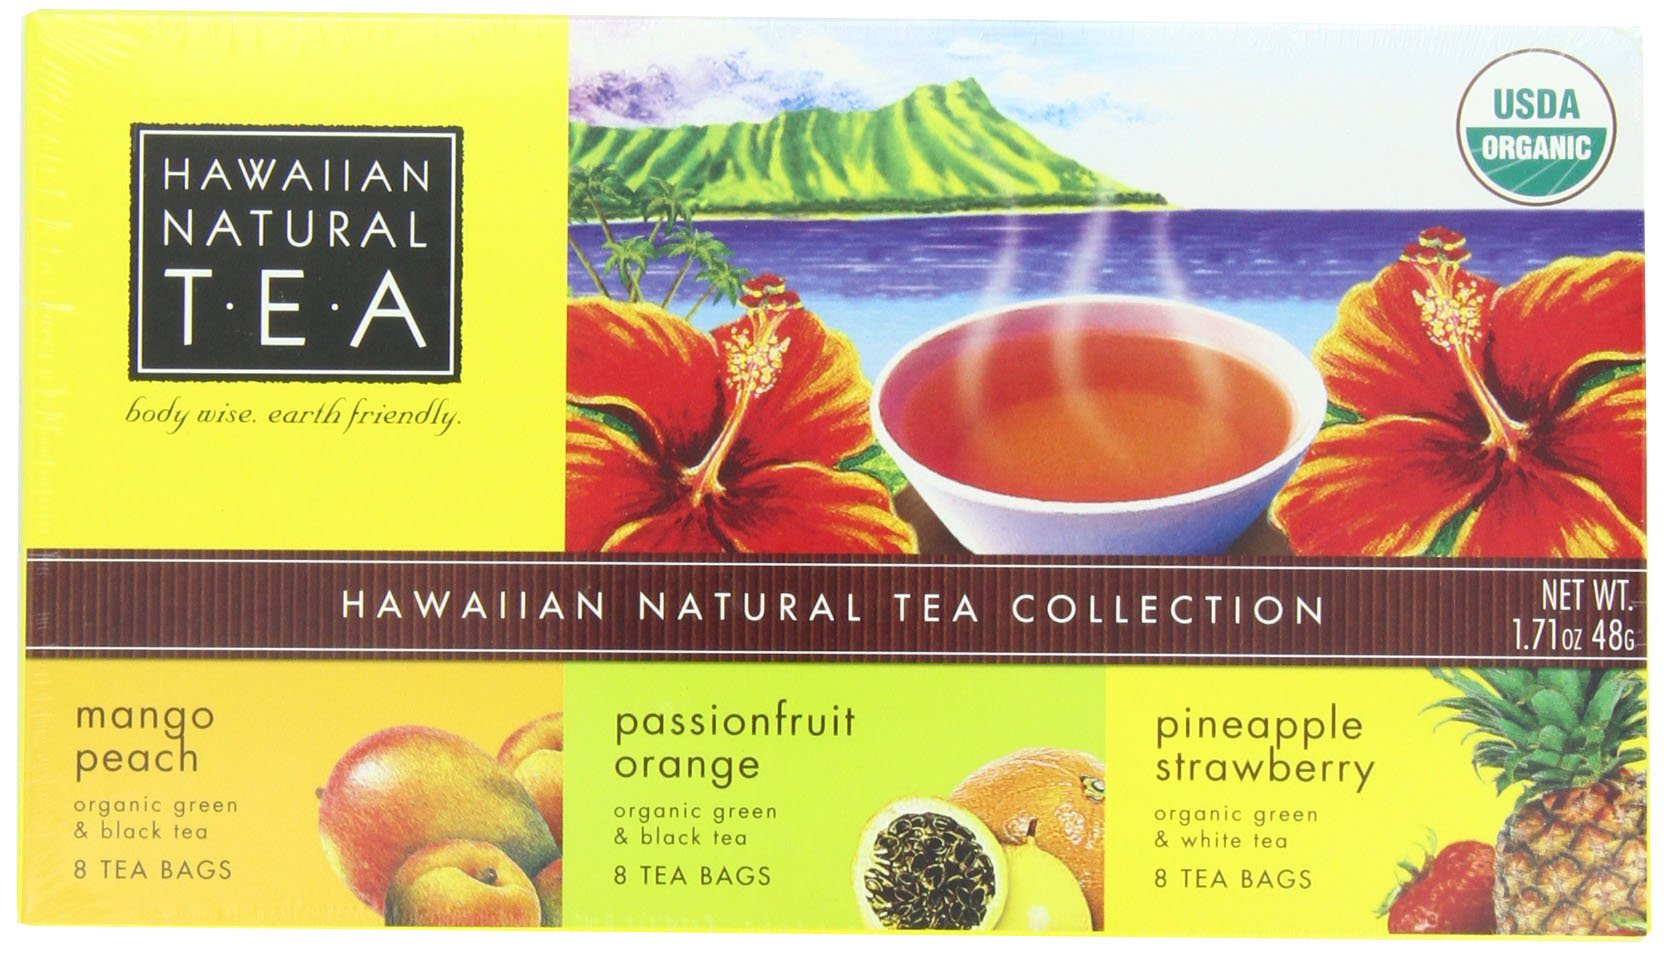 Hawaiian Natural Tea 3 Box Gift Set (3 Flavors), 24-Count (Pack of 2)